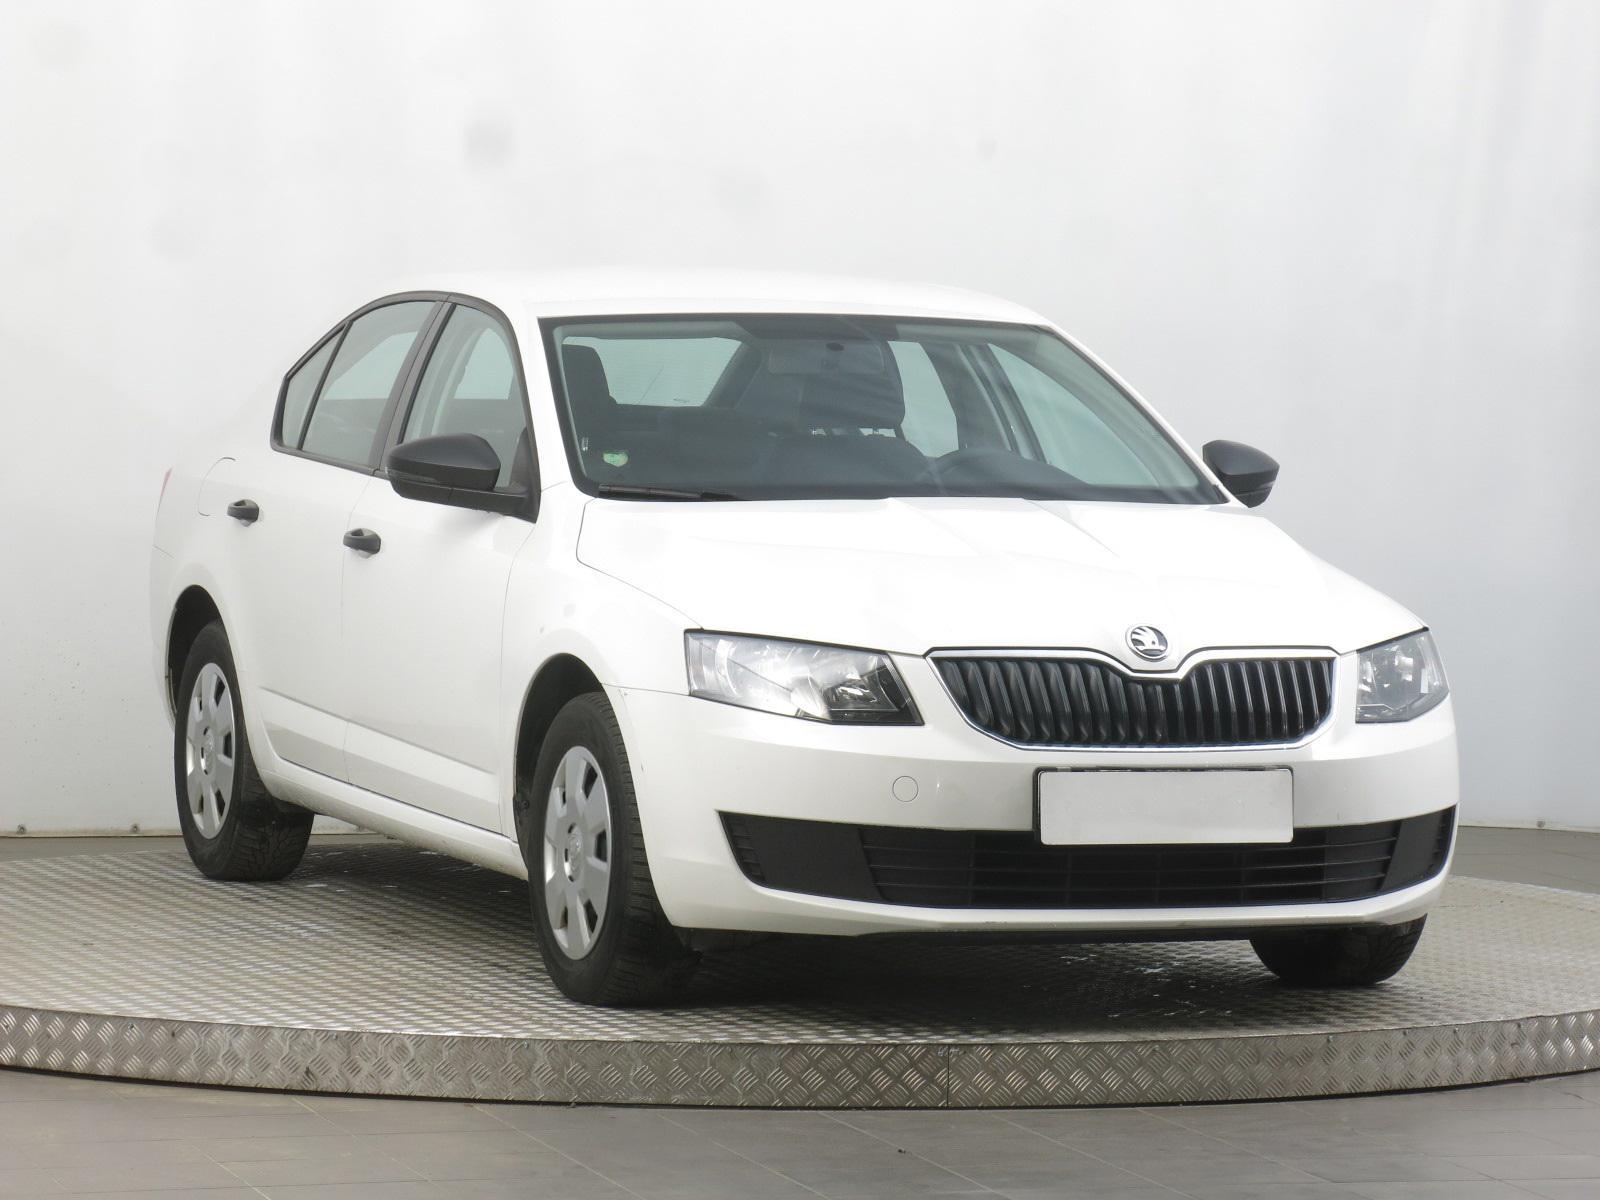 Škoda Octavia 1.2 TSI 63kW hatchback benzin